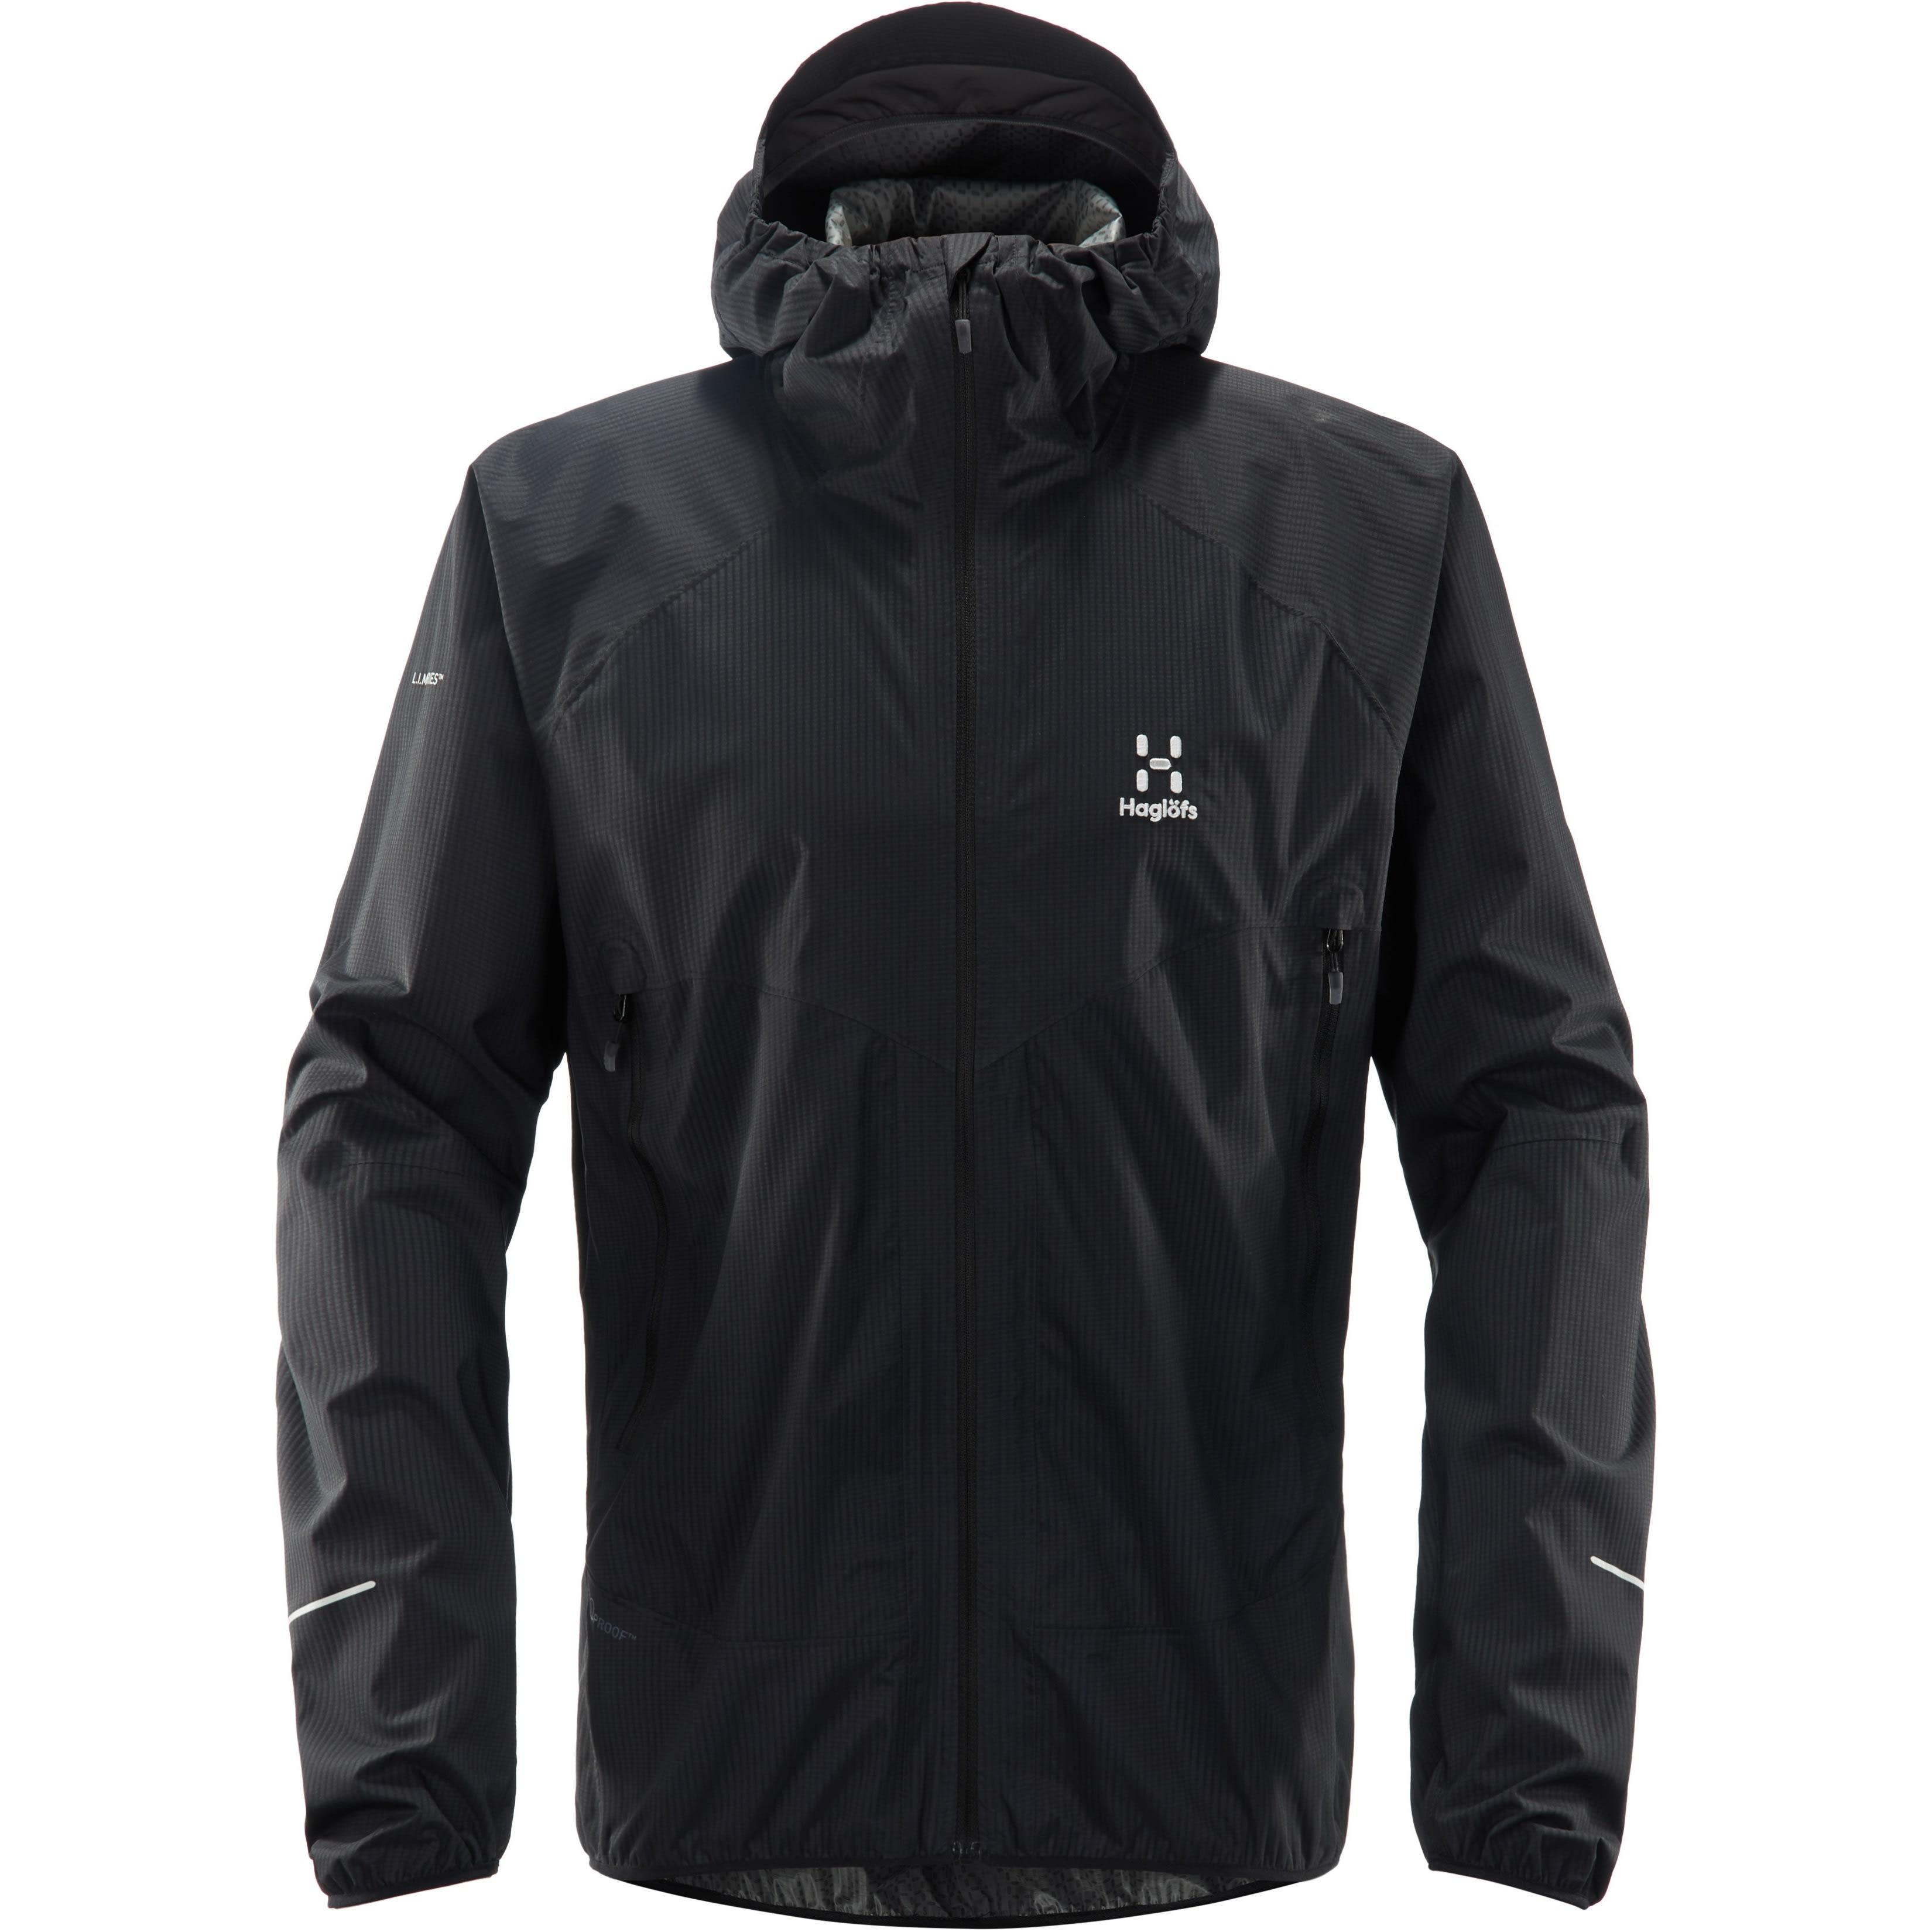 8b9461ff4f5a Køb Haglöfs L.I.M PROOF Multi Jacket Men fra Outnorth